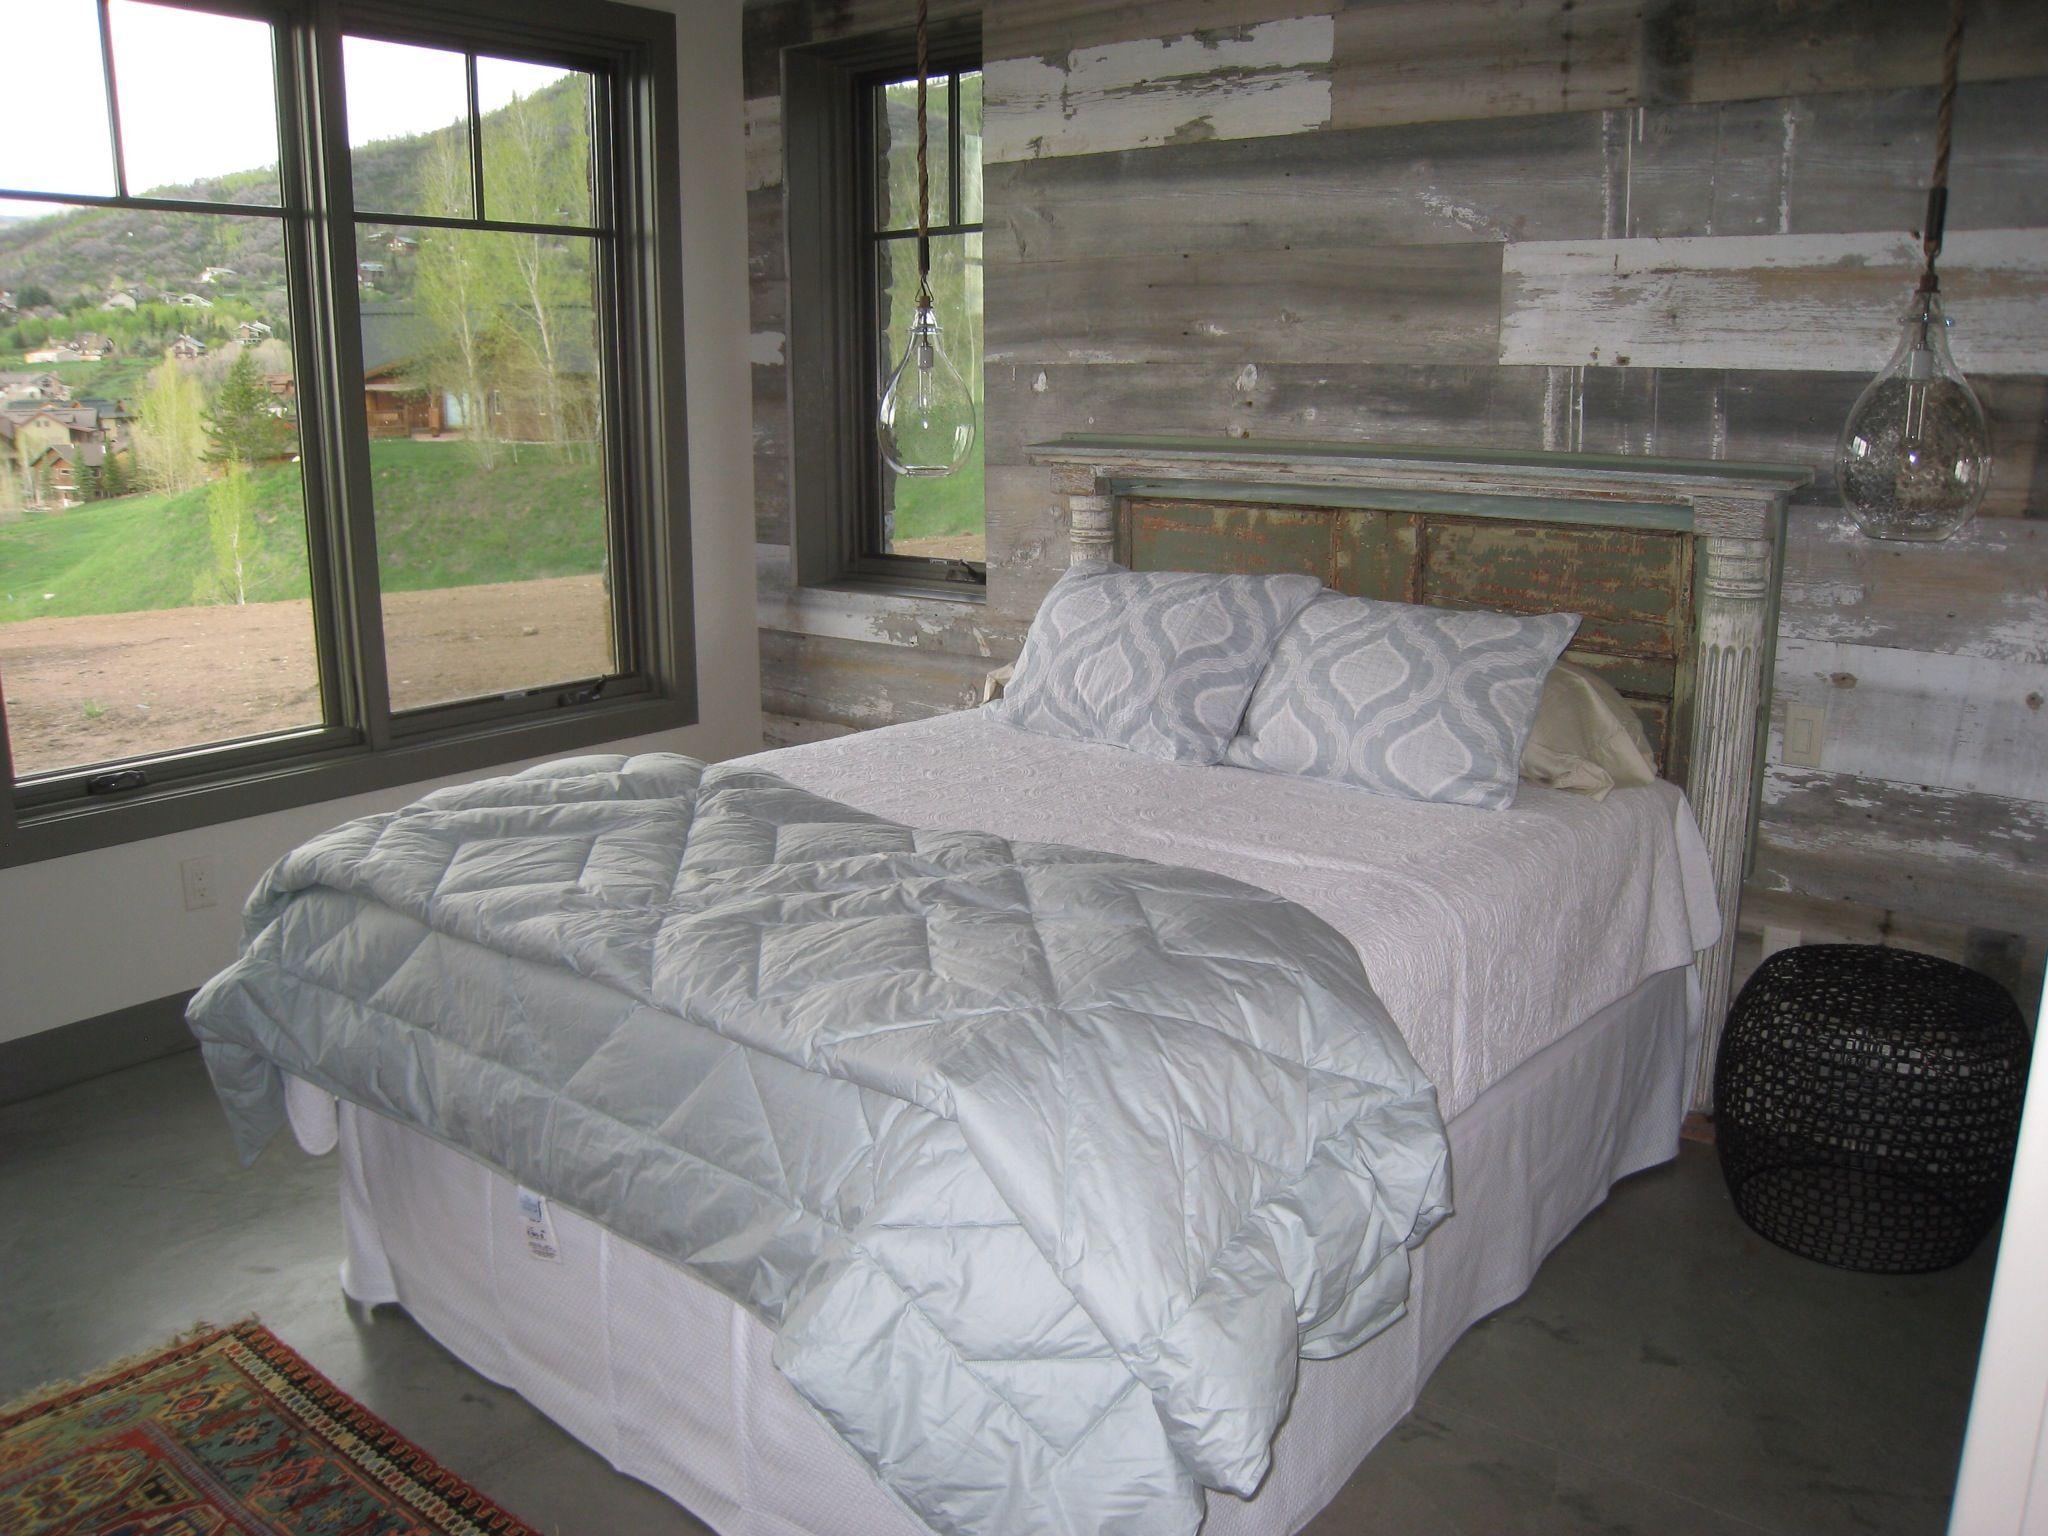 Need a new idea? Add white /grey barn board siding and